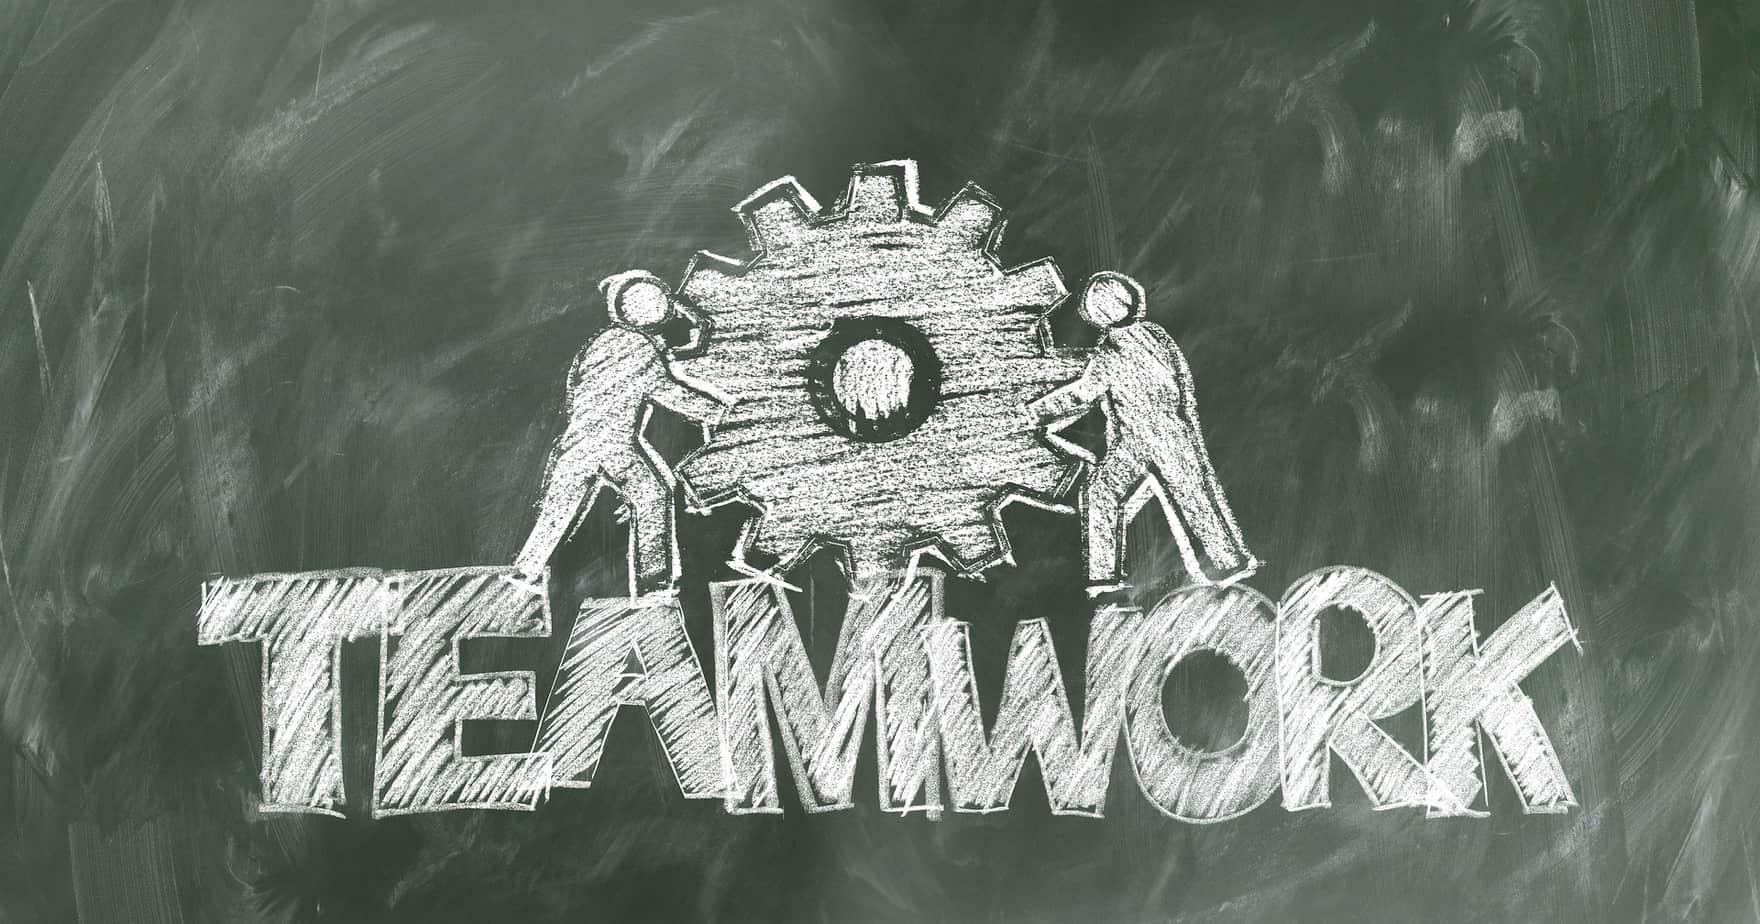 driving team work pays